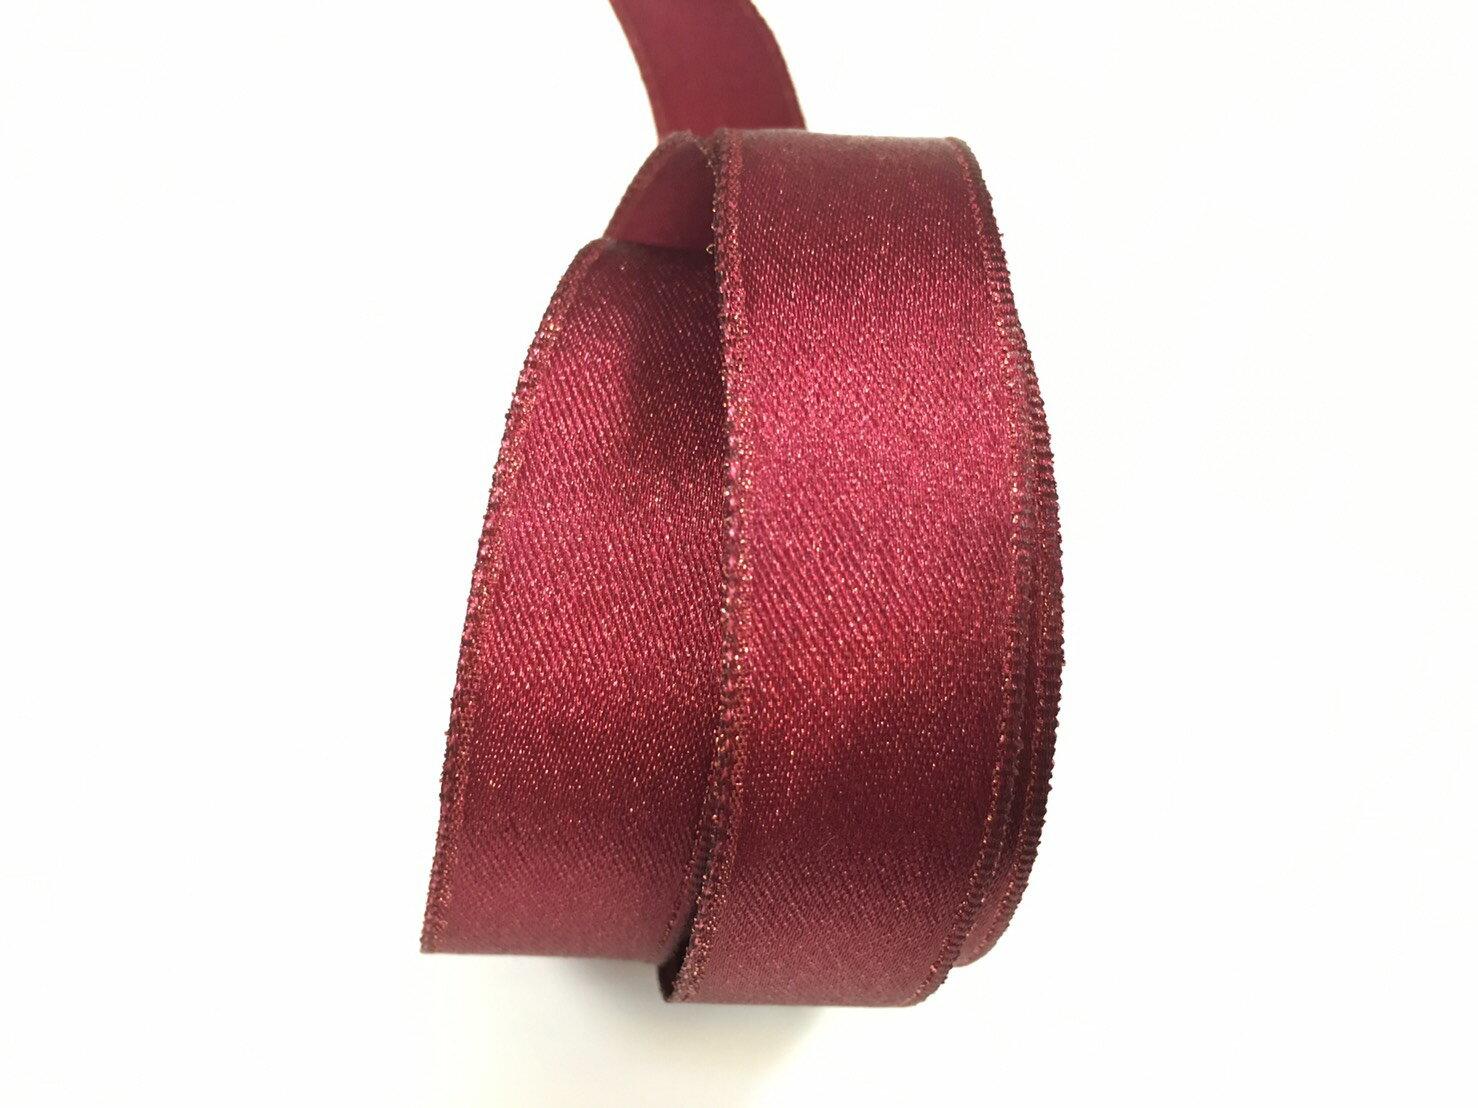 【Crystal Rose緞帶專賣店】金粉緞面鐵絲帶  3碼 (10色) 8